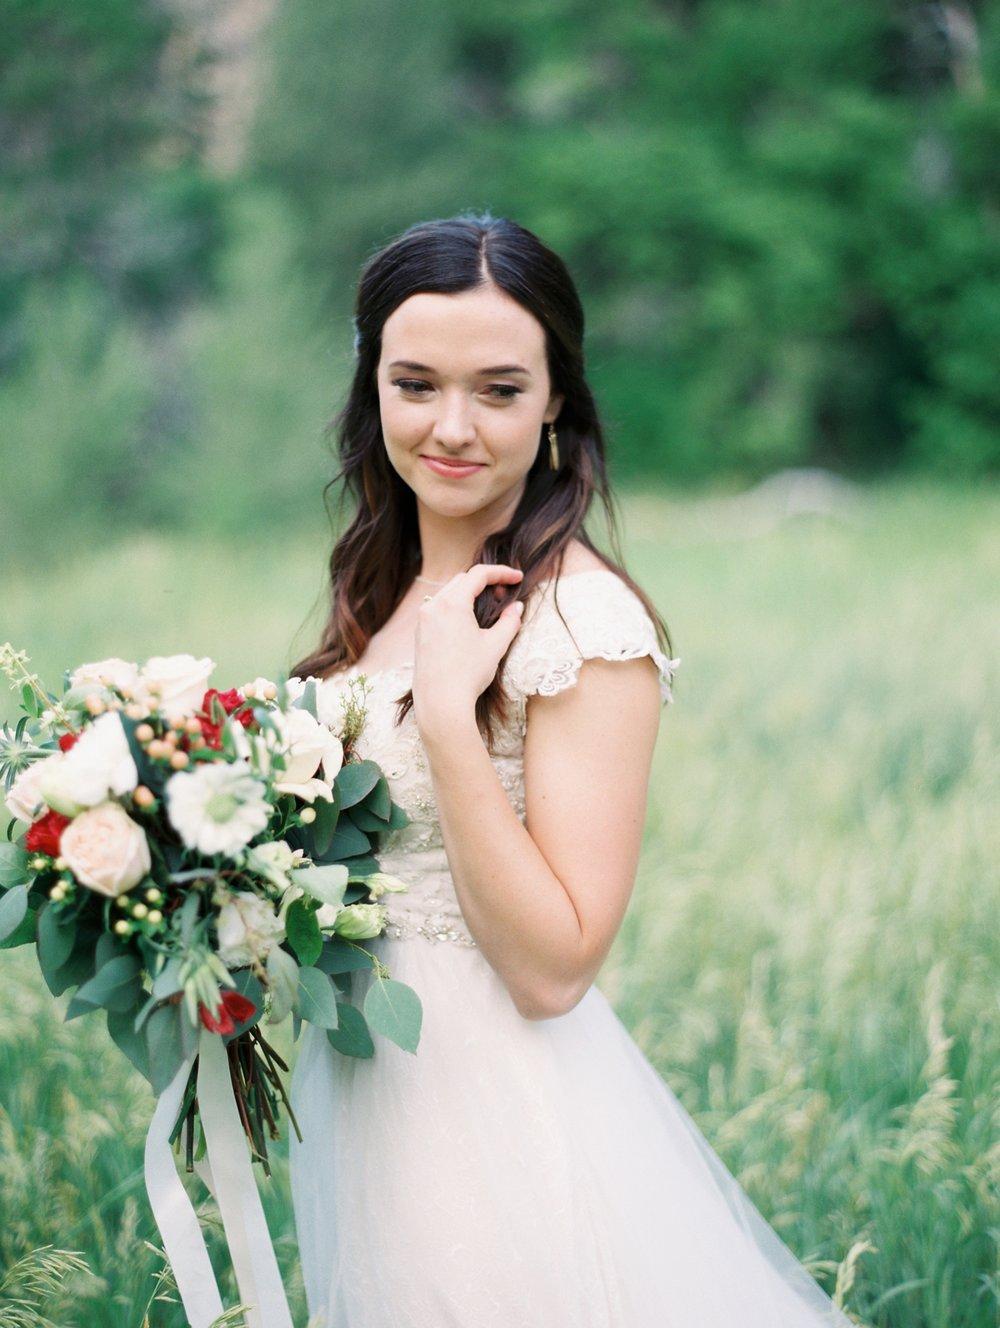 utah-bridal-mountain-portraits-0020.jpg